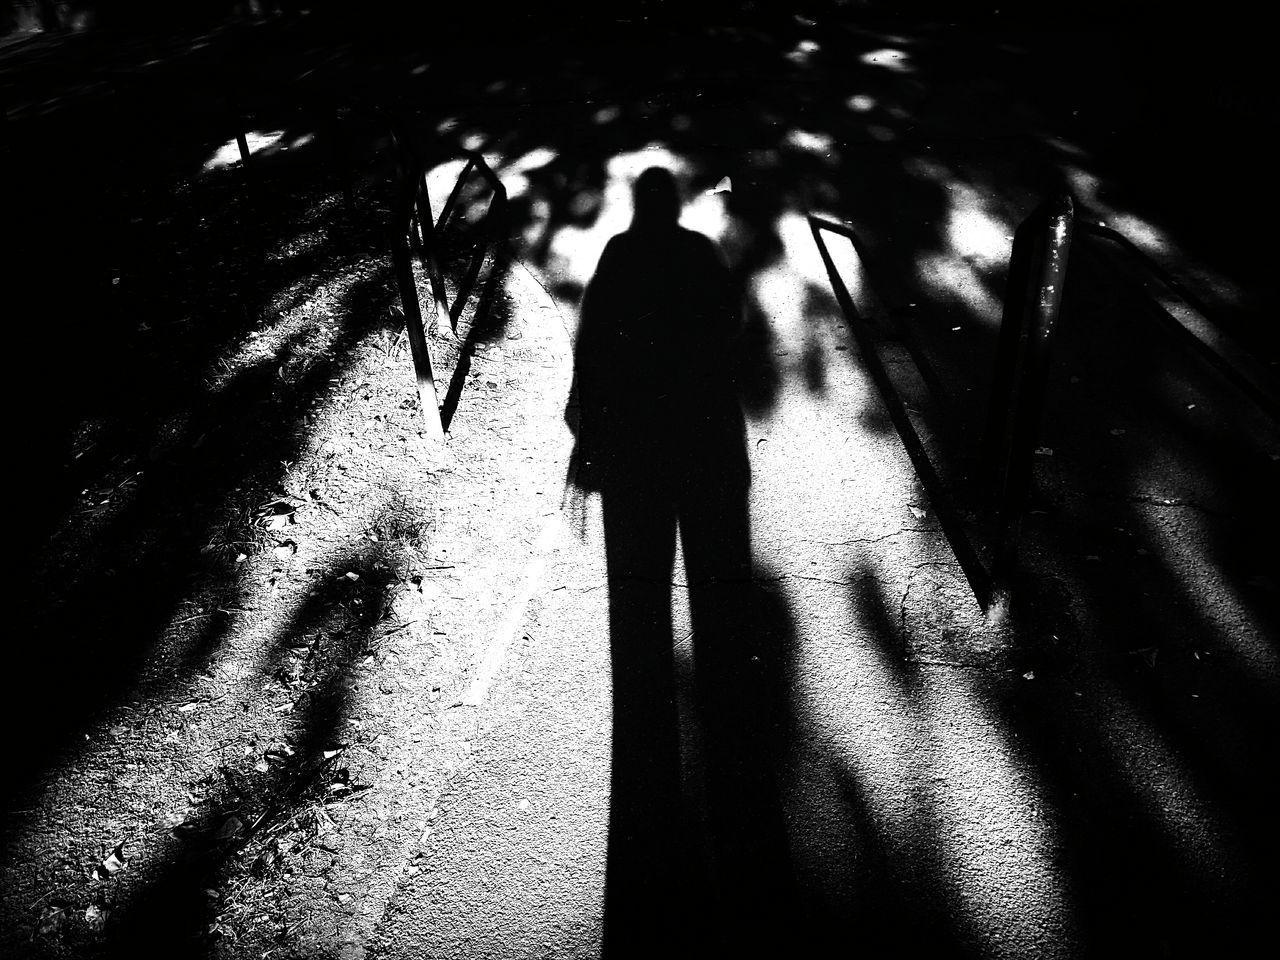 Shadow Focus On Shadow Mystery Lights Illusion Eyeemphotography Eyem Best Shots EyeEm Best Shots - Black + White Reflection Woow Creativity